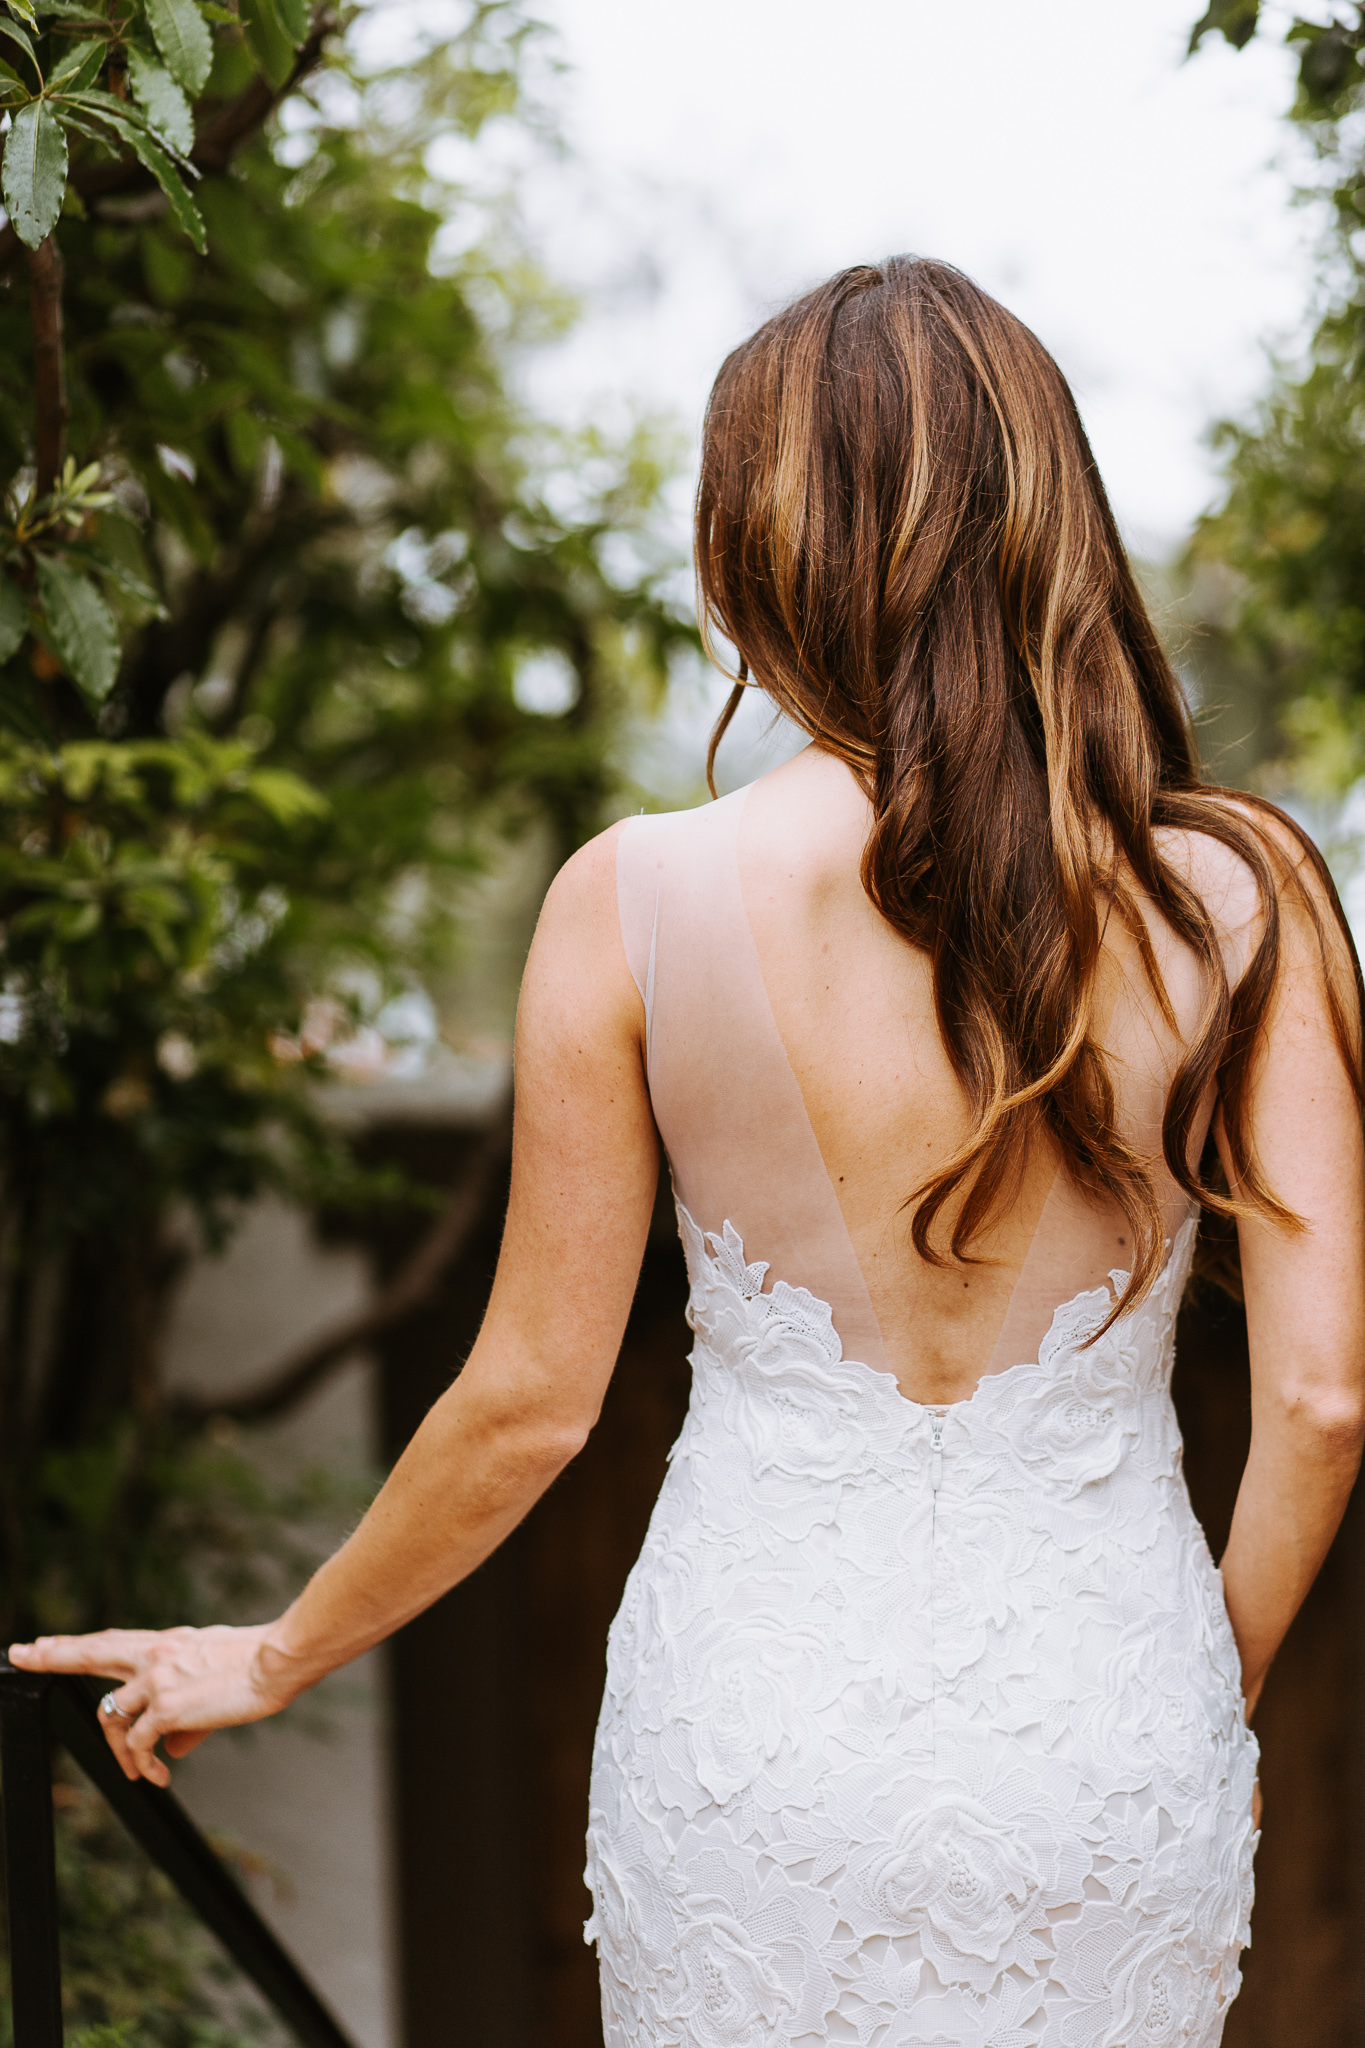 LagunaBeach-WeddingPhotographer-15.jpg